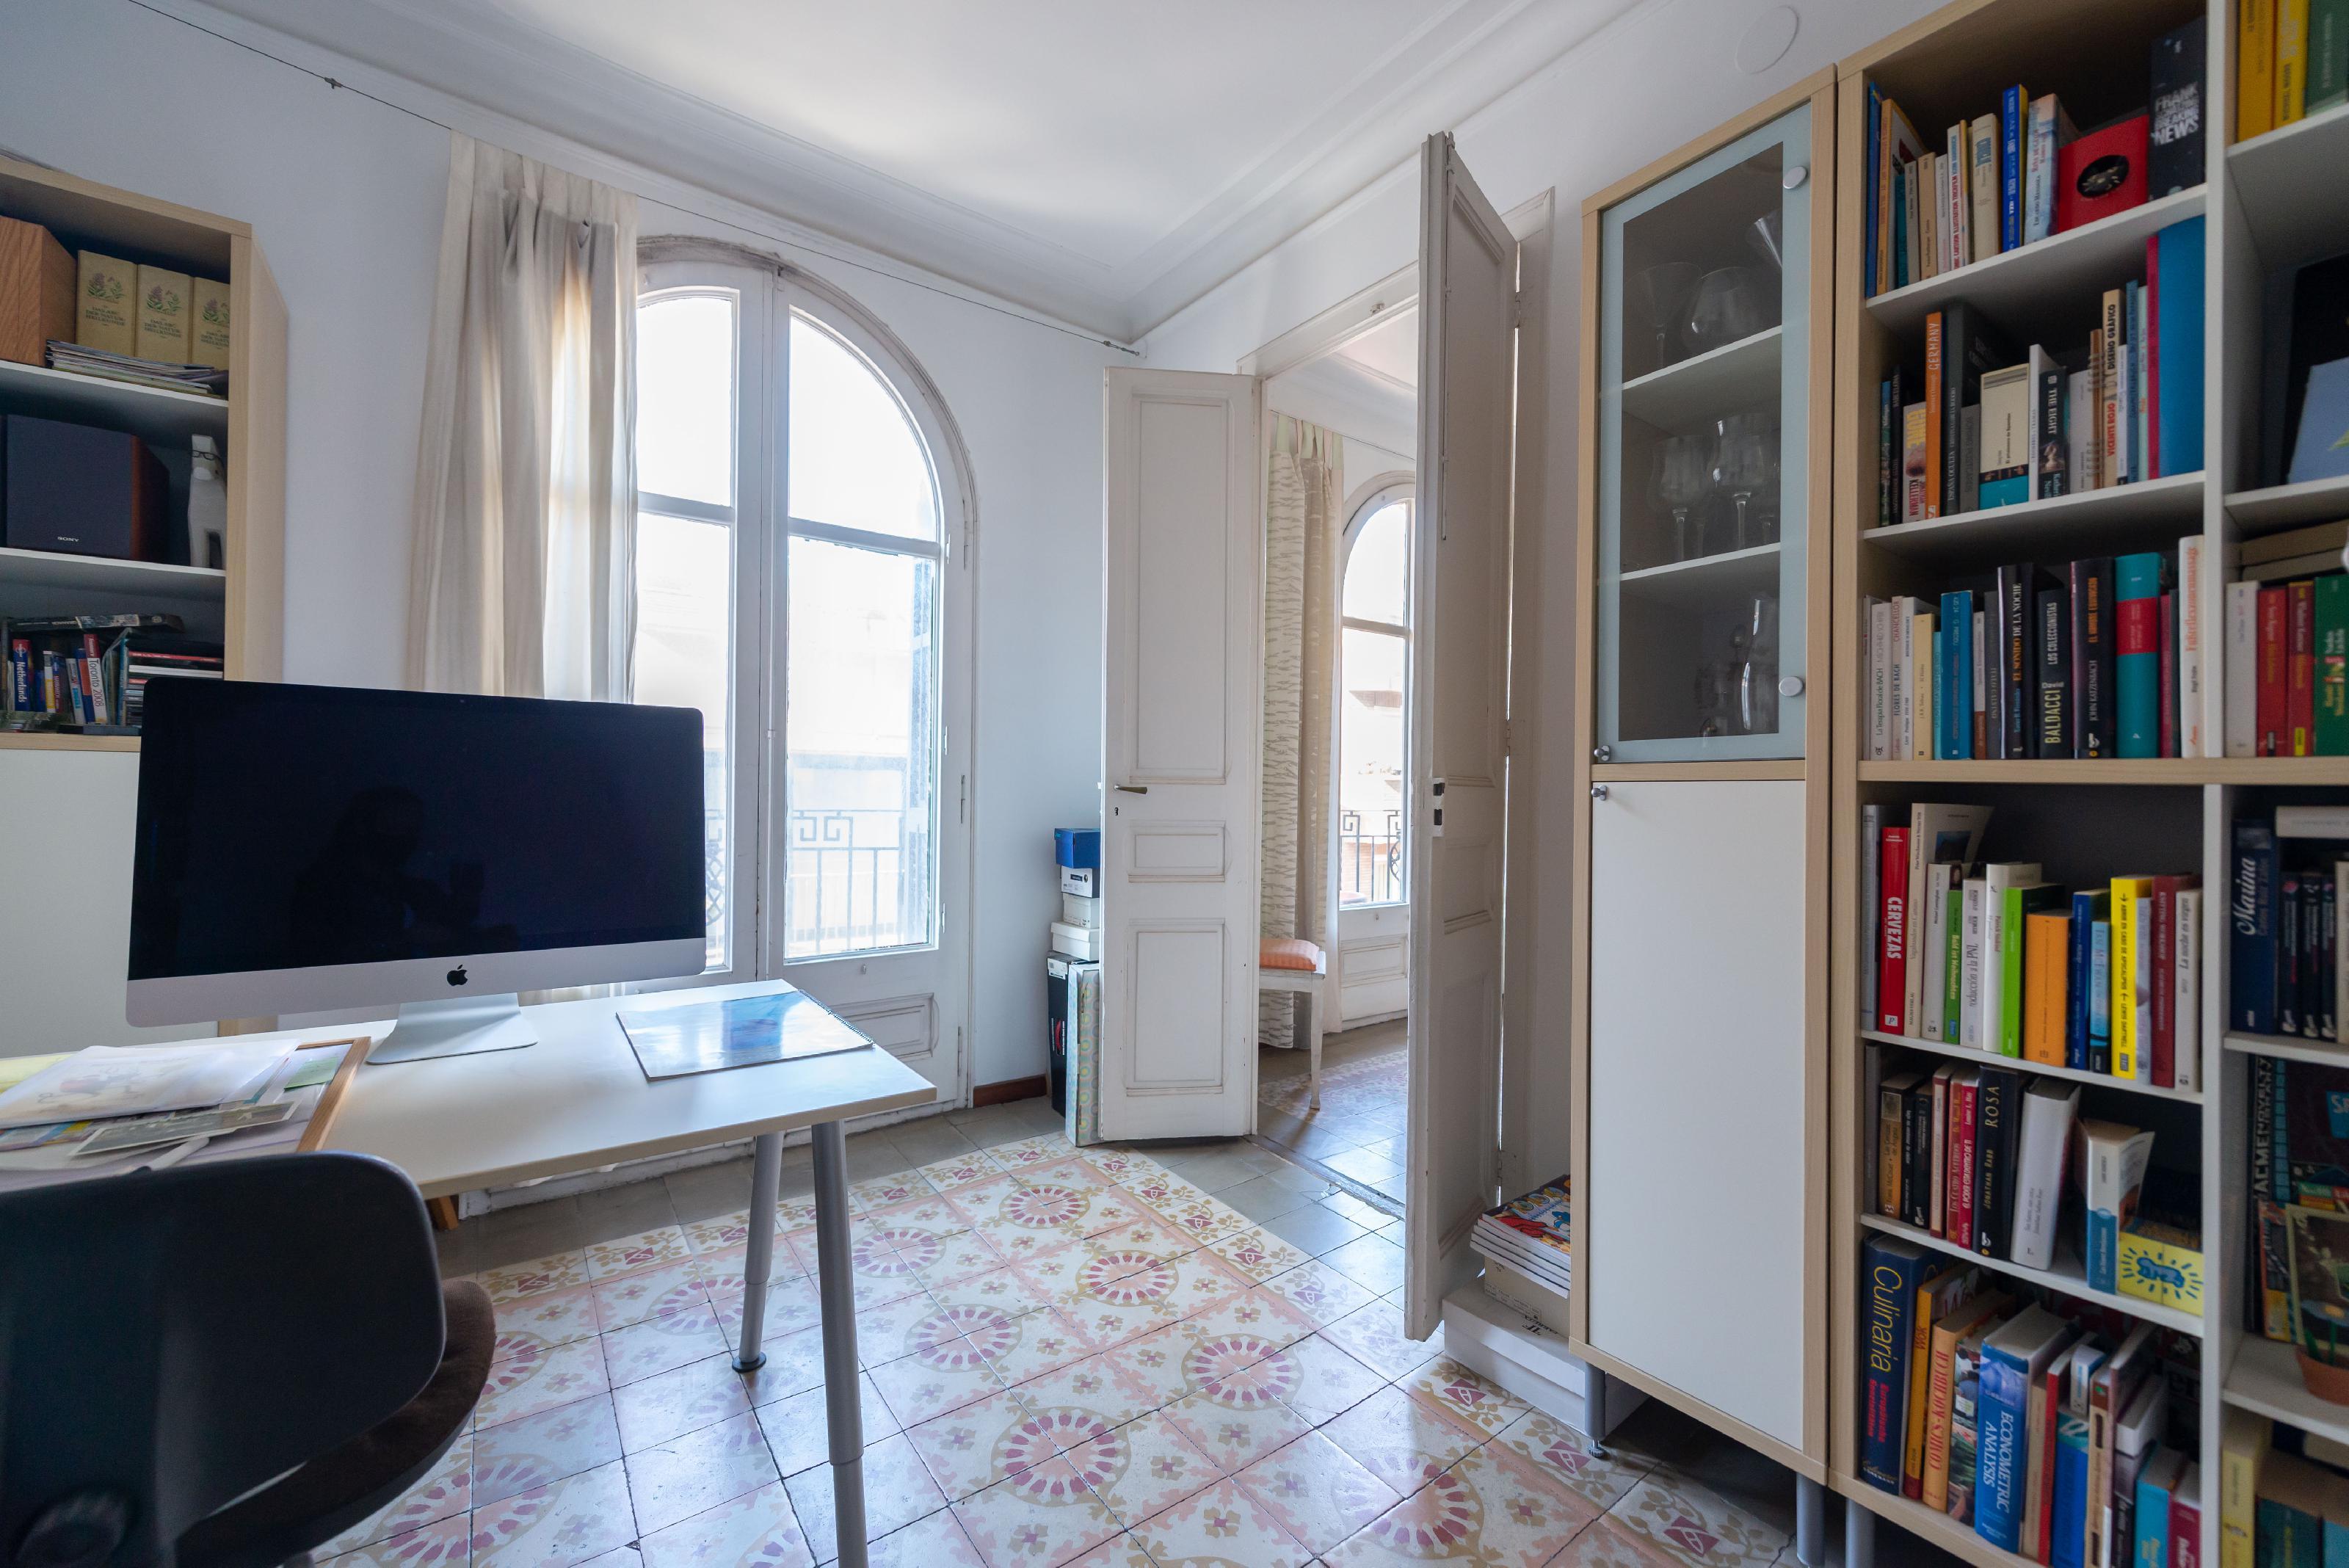 250582 Flat for sale in Sarrià-Sant Gervasi, Sant Gervasi-Galvany 10